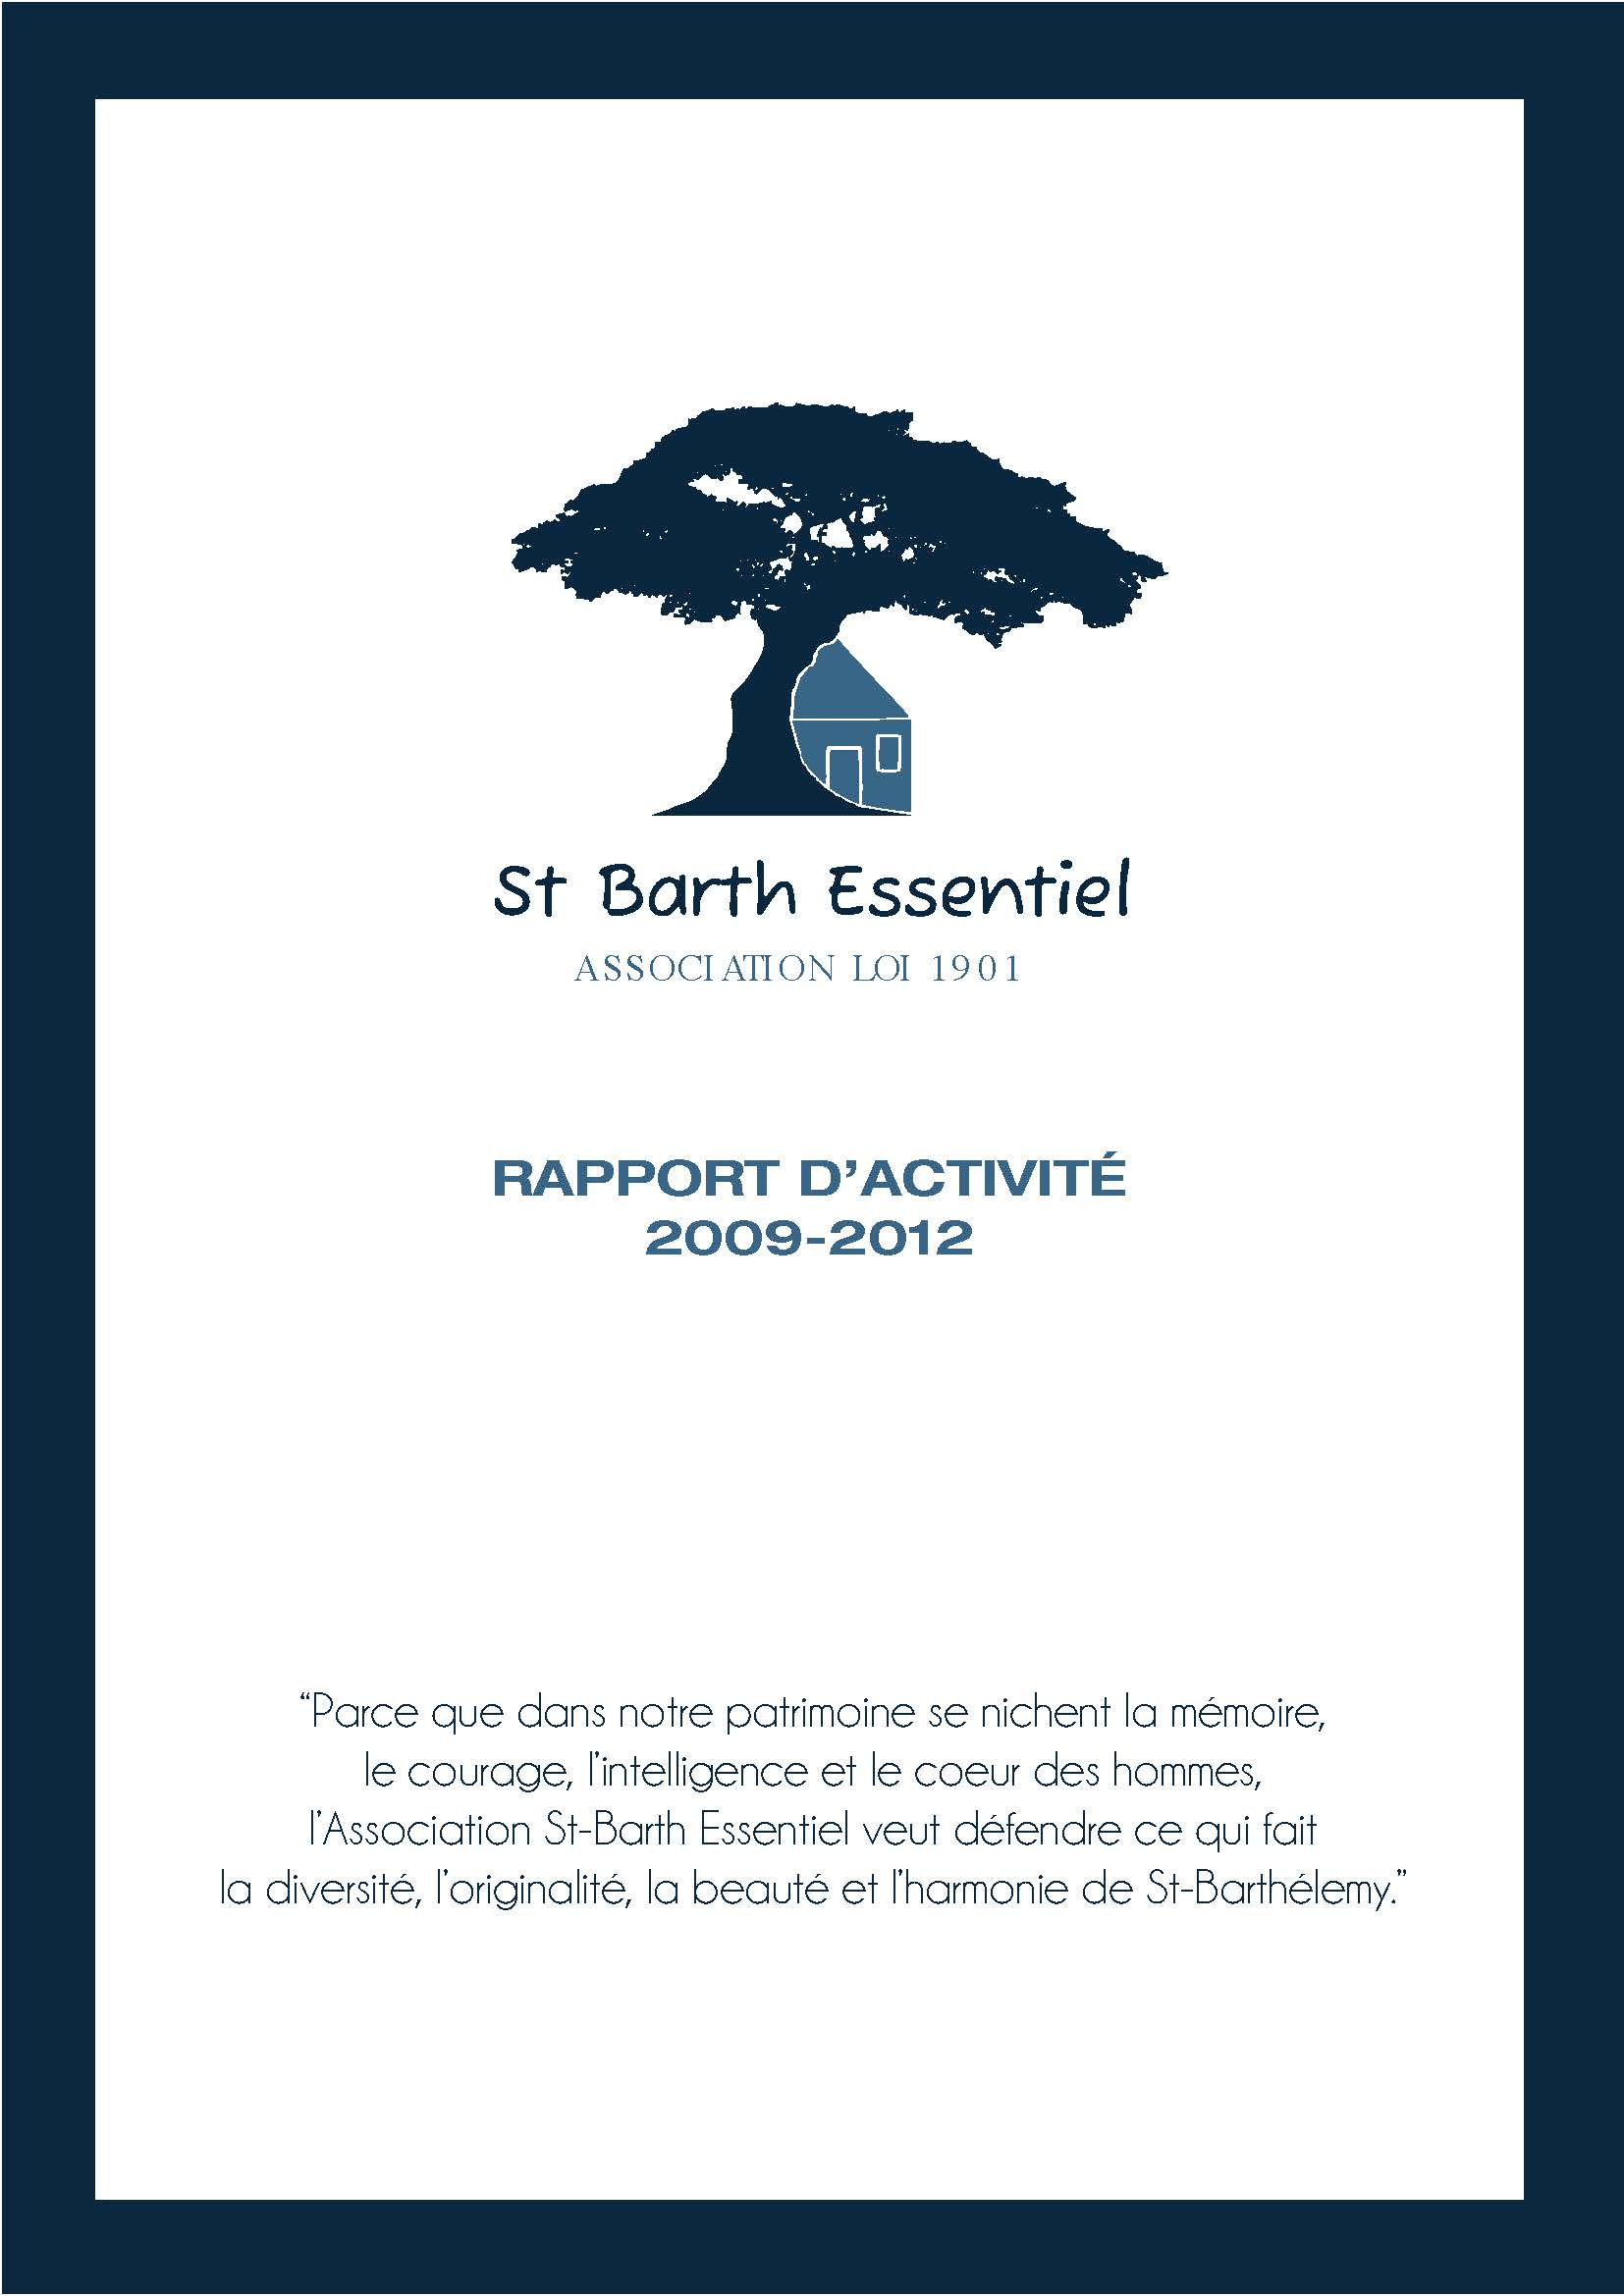 ACTIVITY REPORT 2009-2012